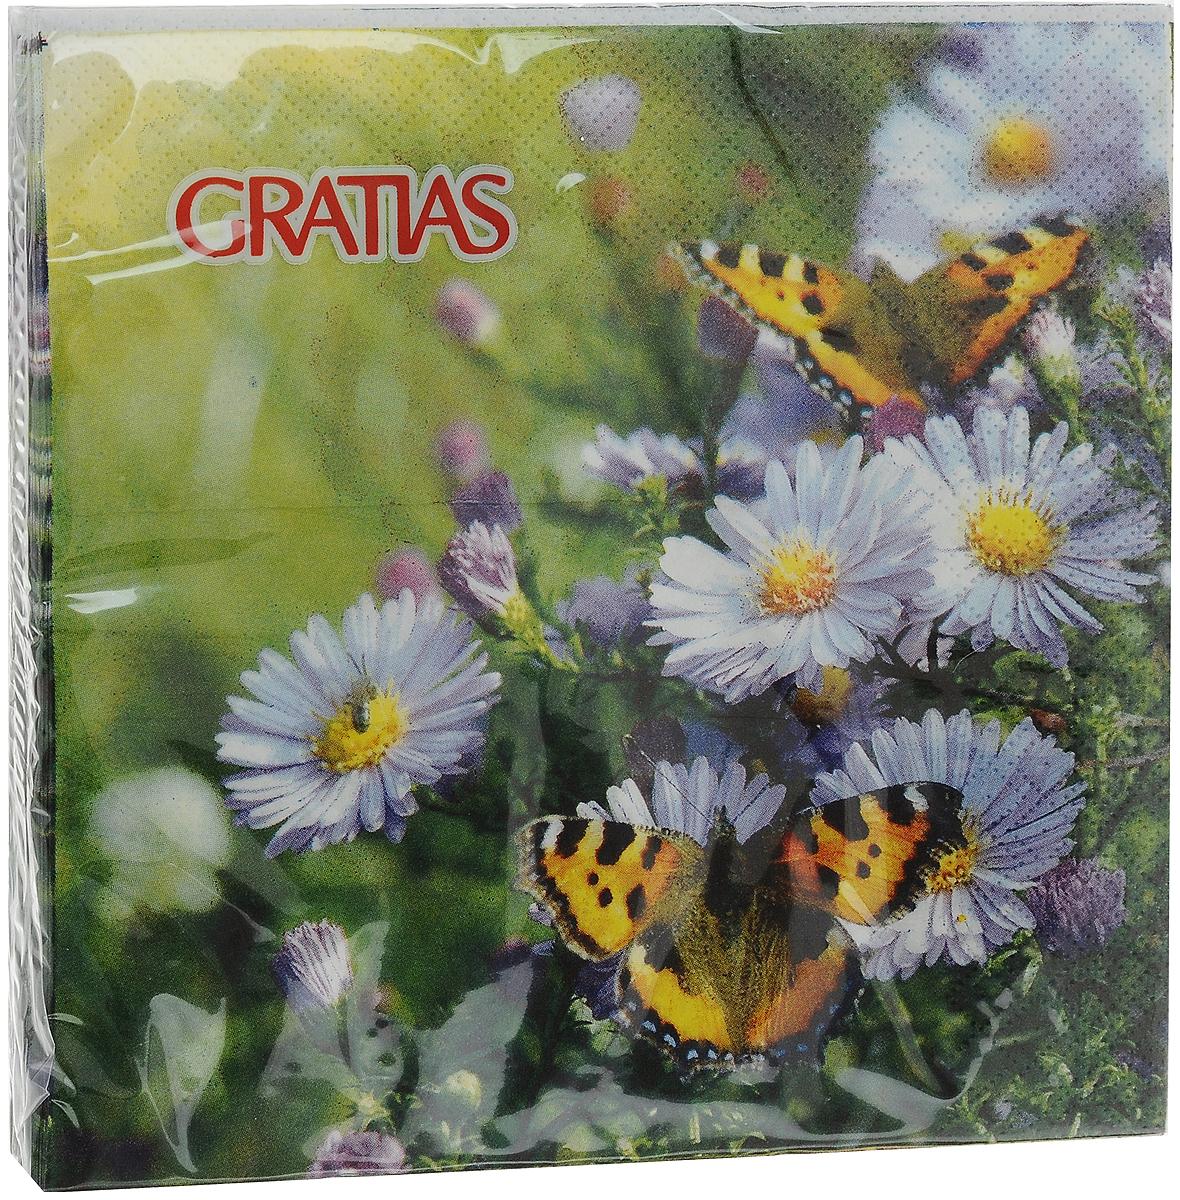 Салфетки бумажные Gratias Шоколадница, трехслойные, 33 х 33 см, 20 шт бра 22 х 33 х 33